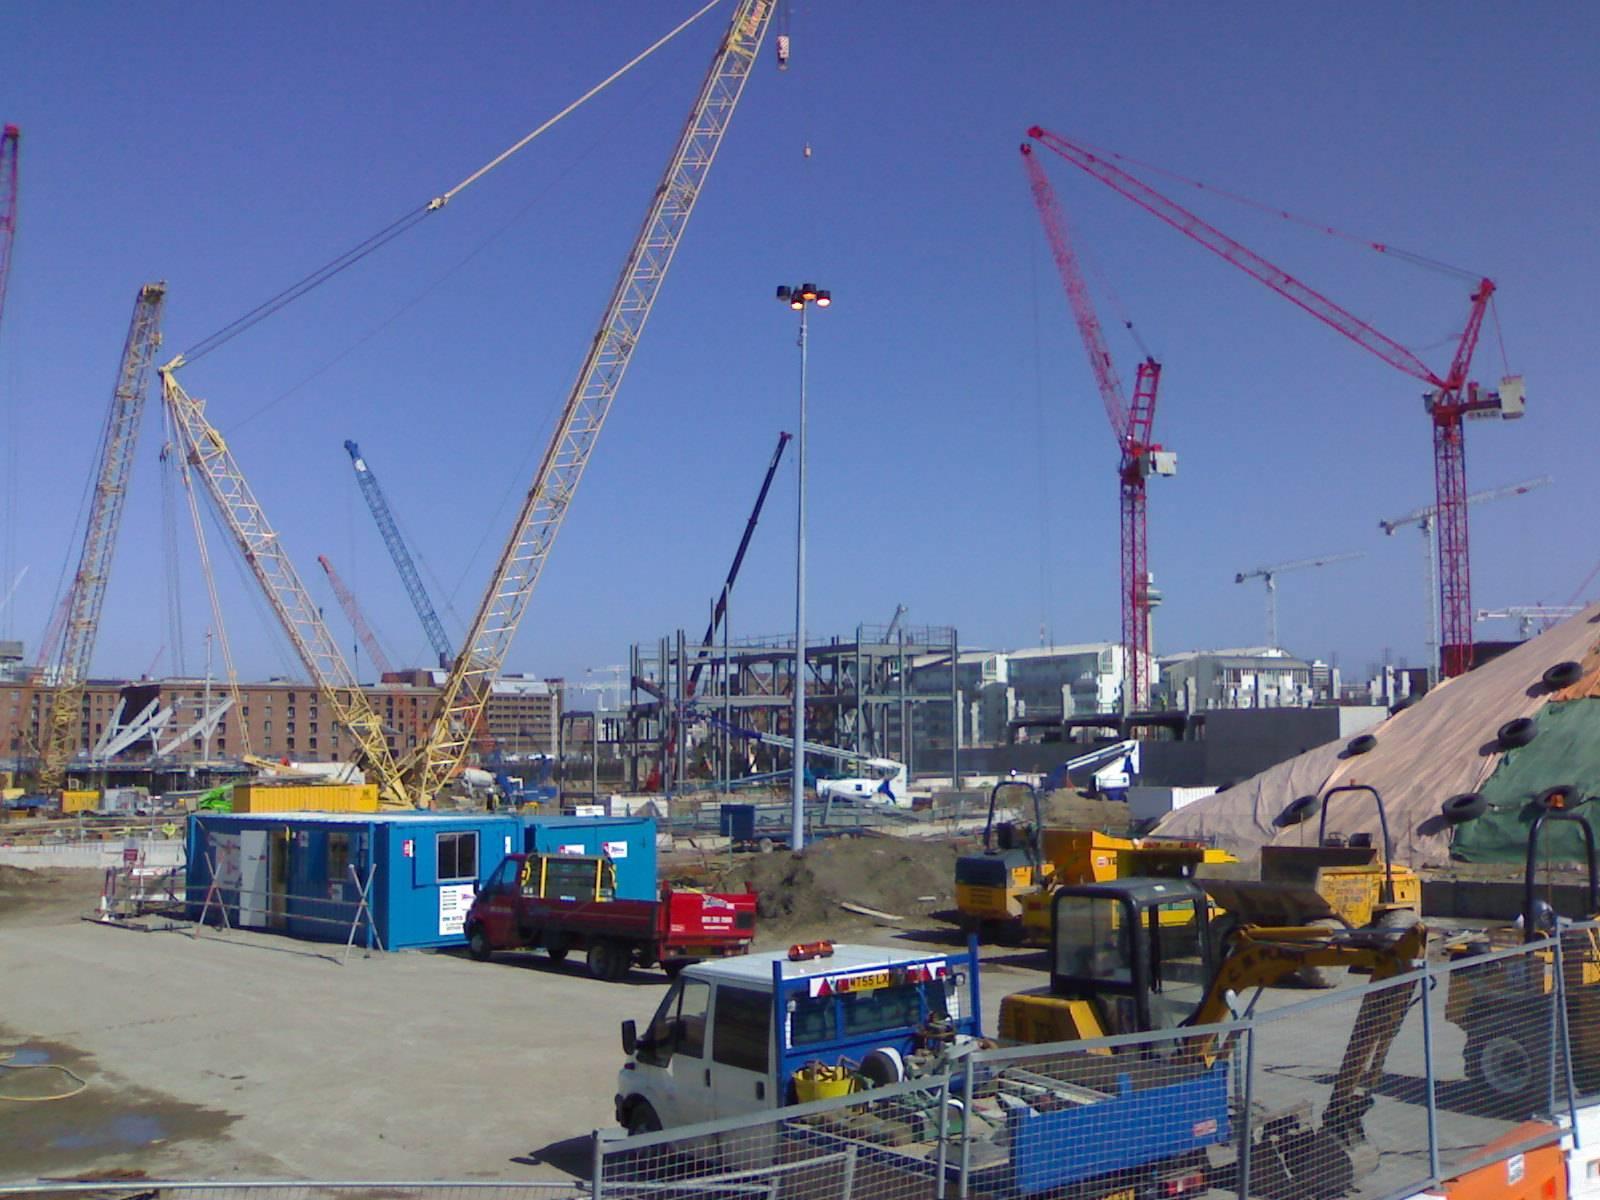 Kings Dock Arena, Liverpool